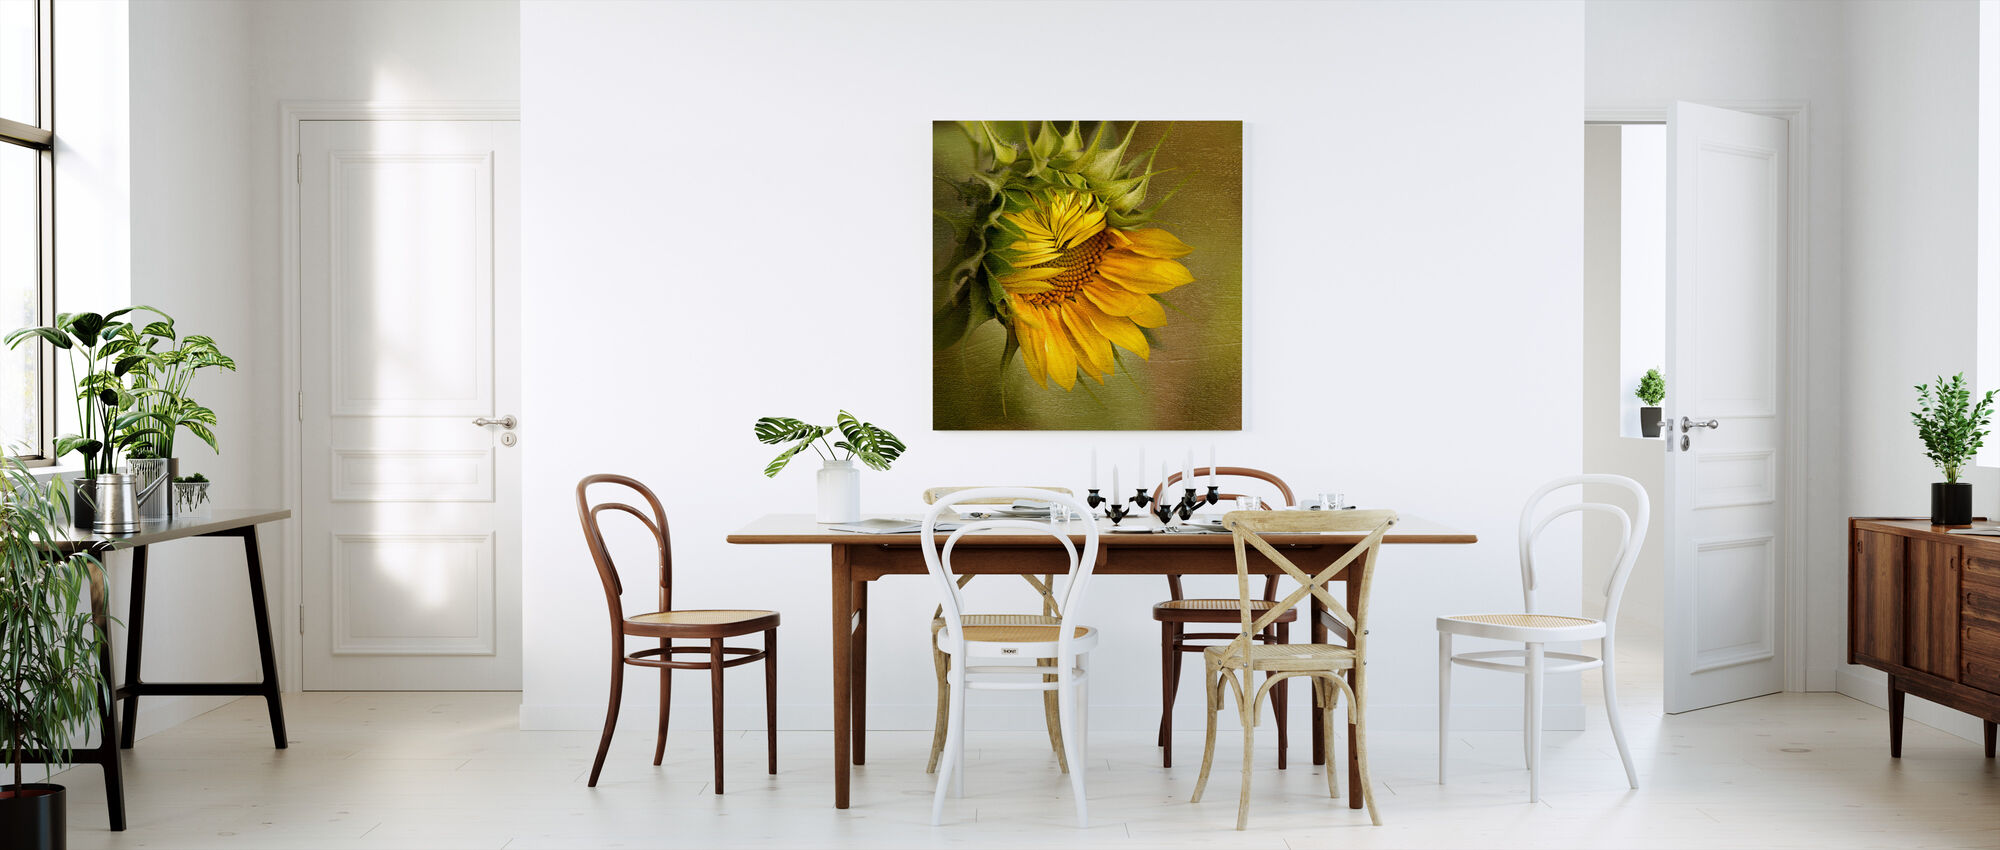 Summer's Beauty - Canvas print - Kitchen